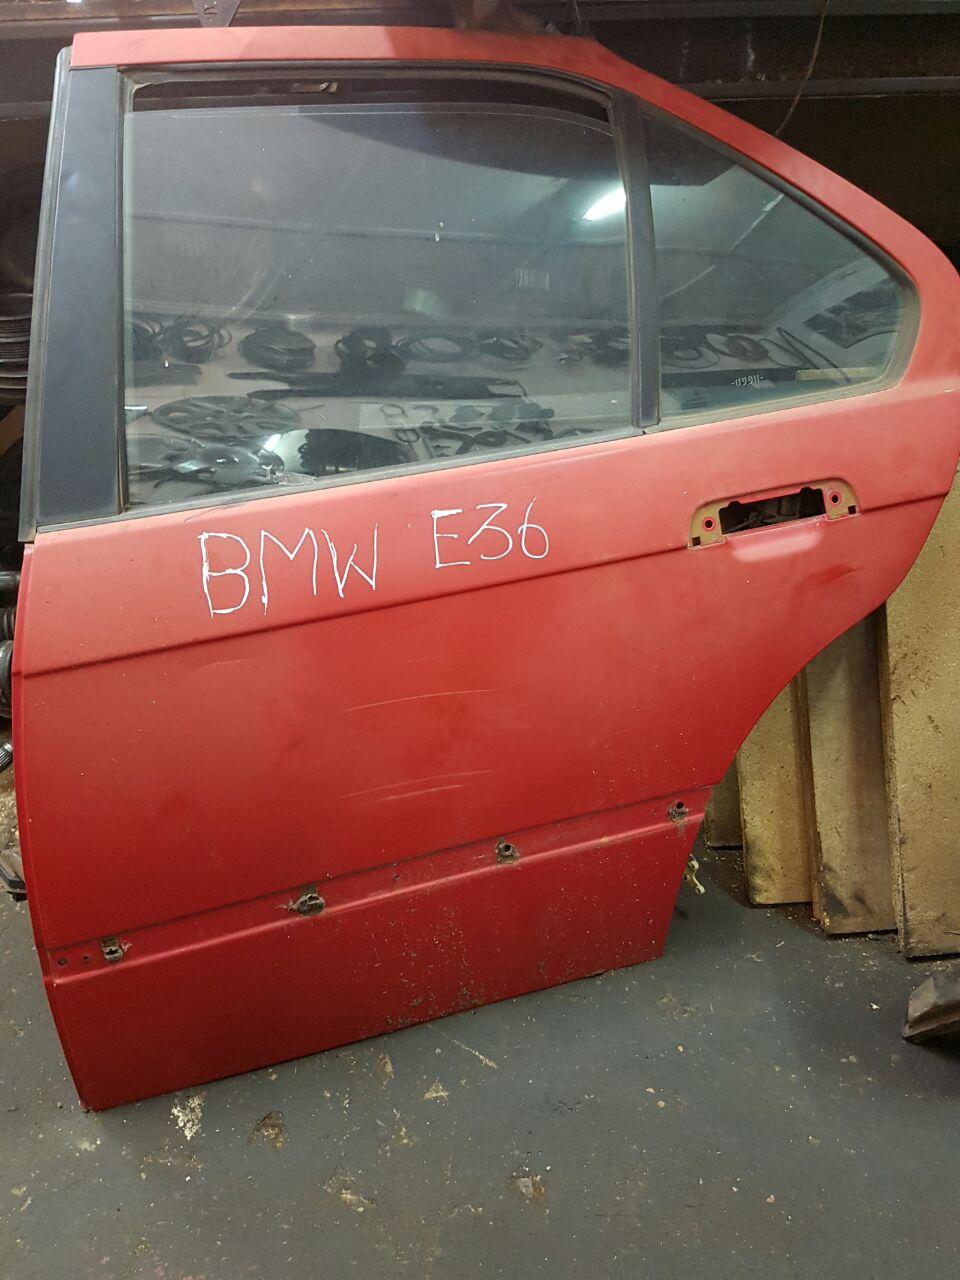 Bmw e36 doors